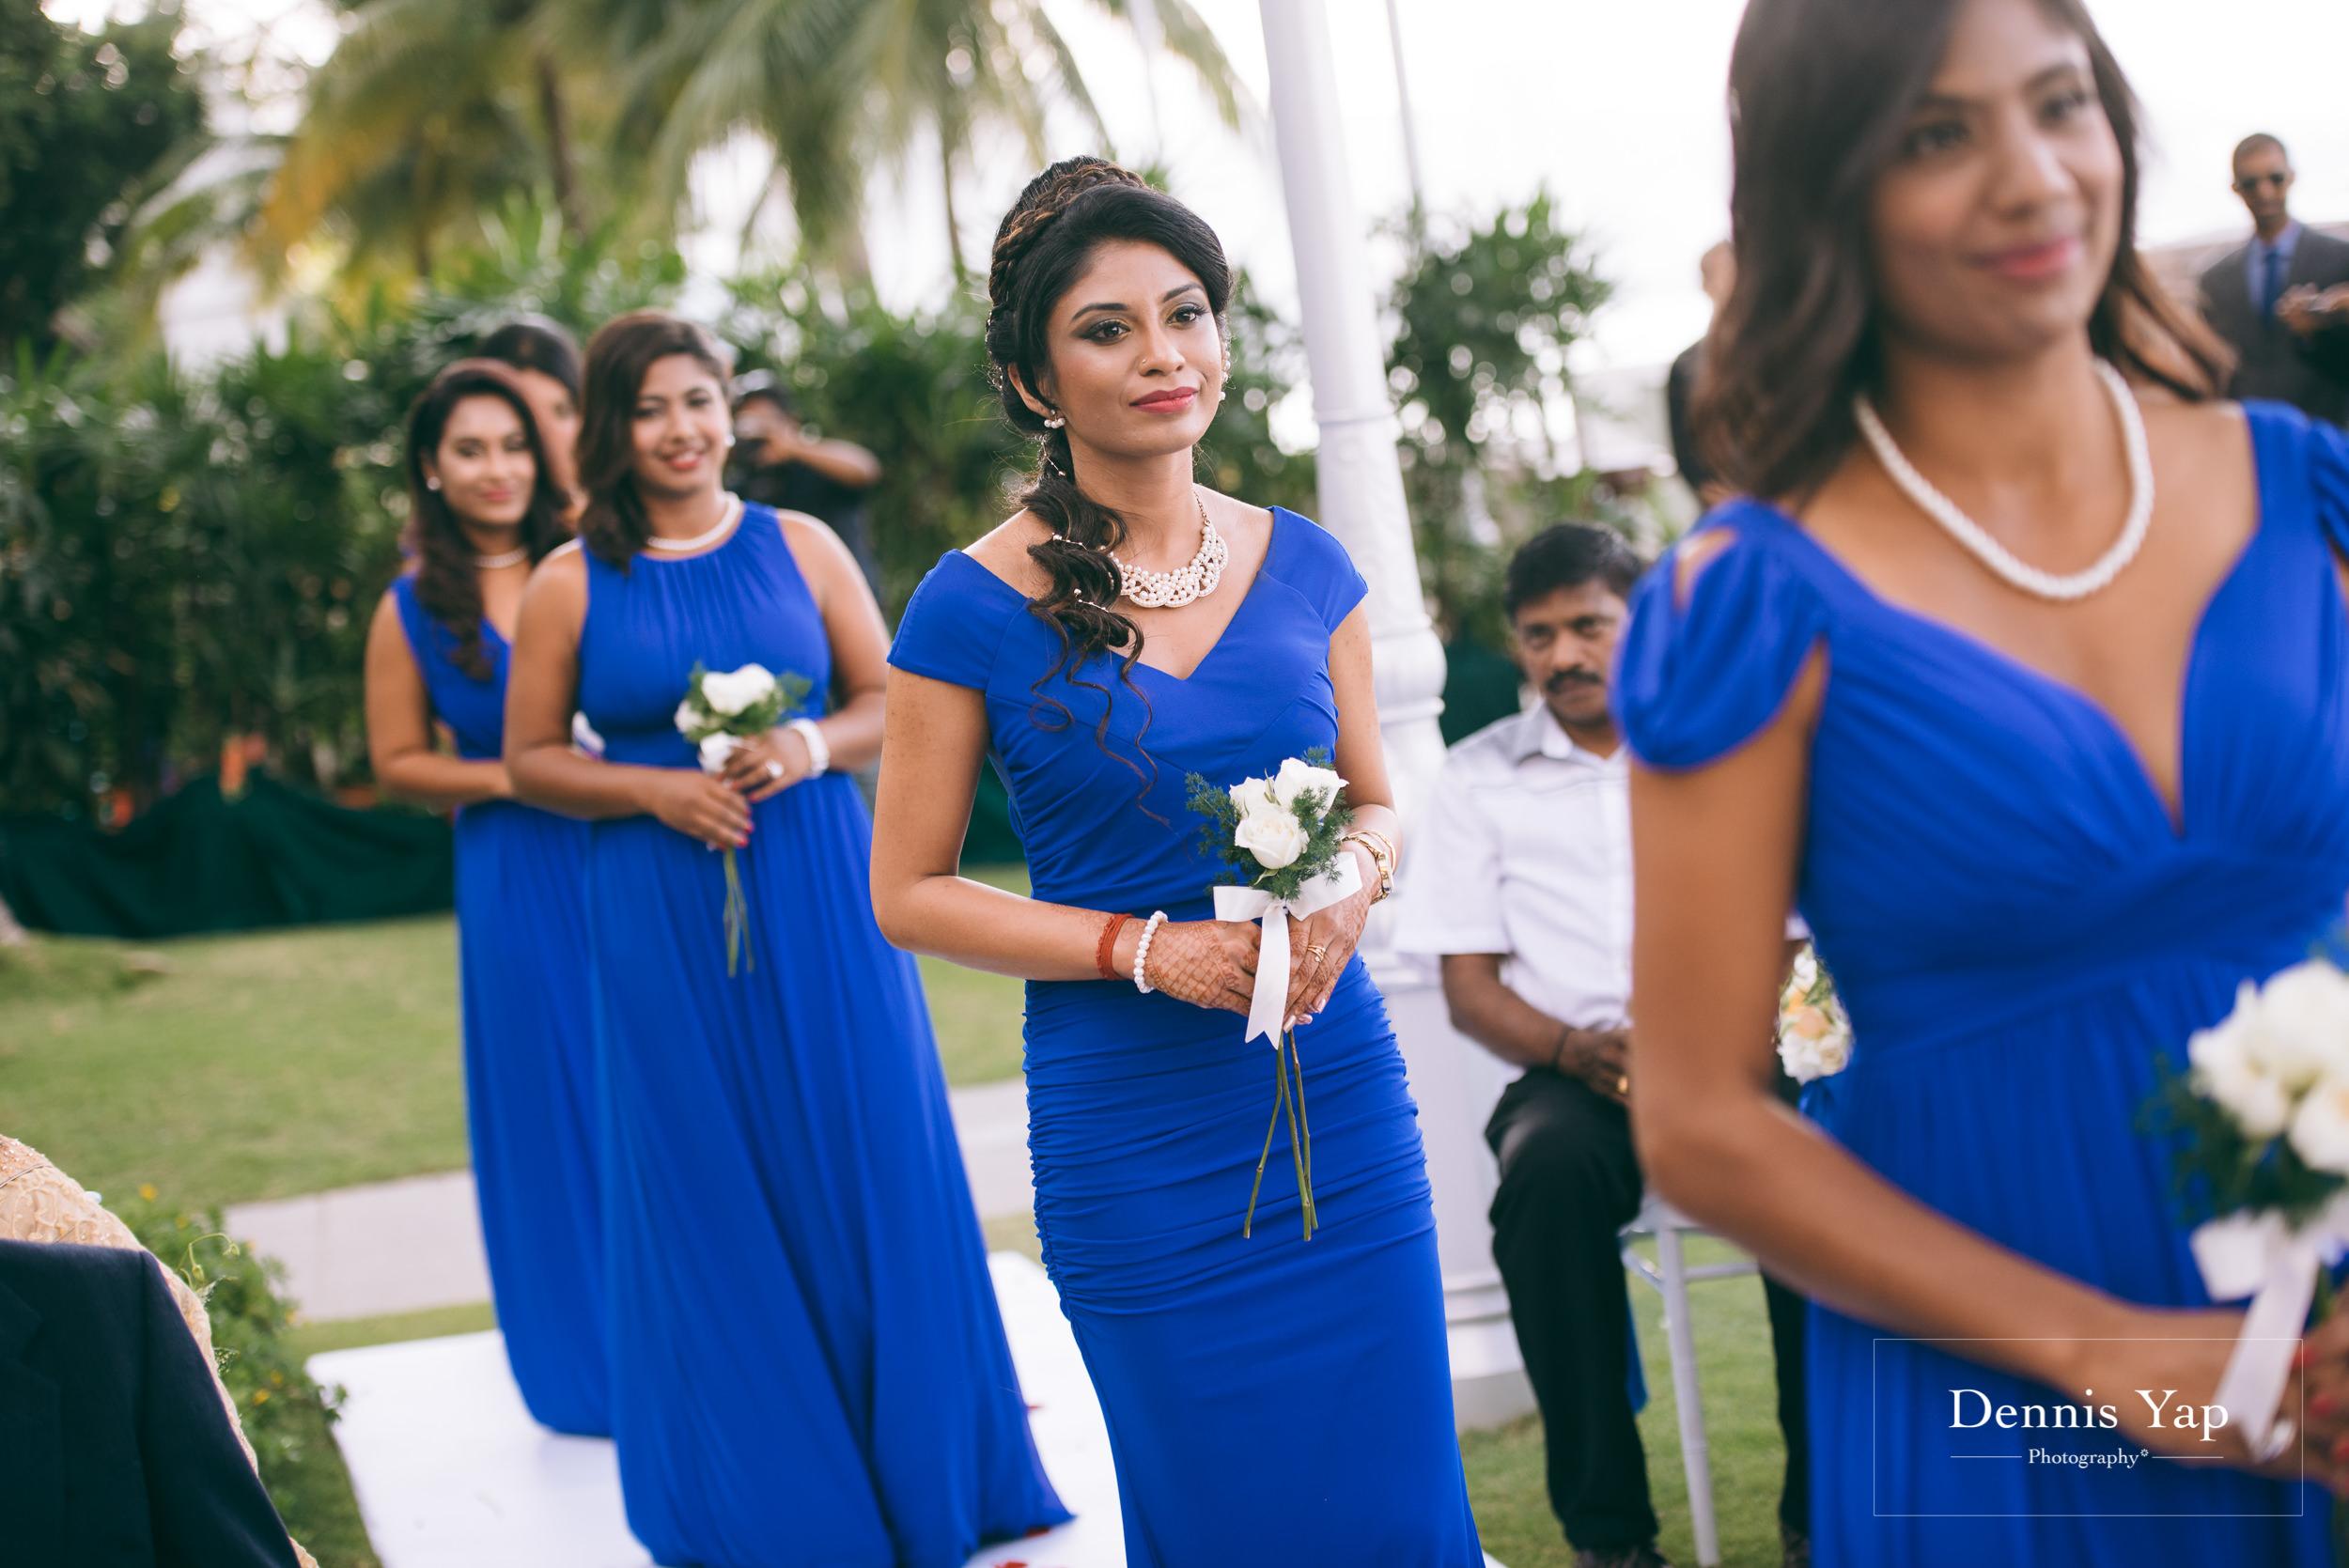 kelvin kosyilya garden wedding penang E and O hotel dennis yap indian wedding photographer-15.jpg